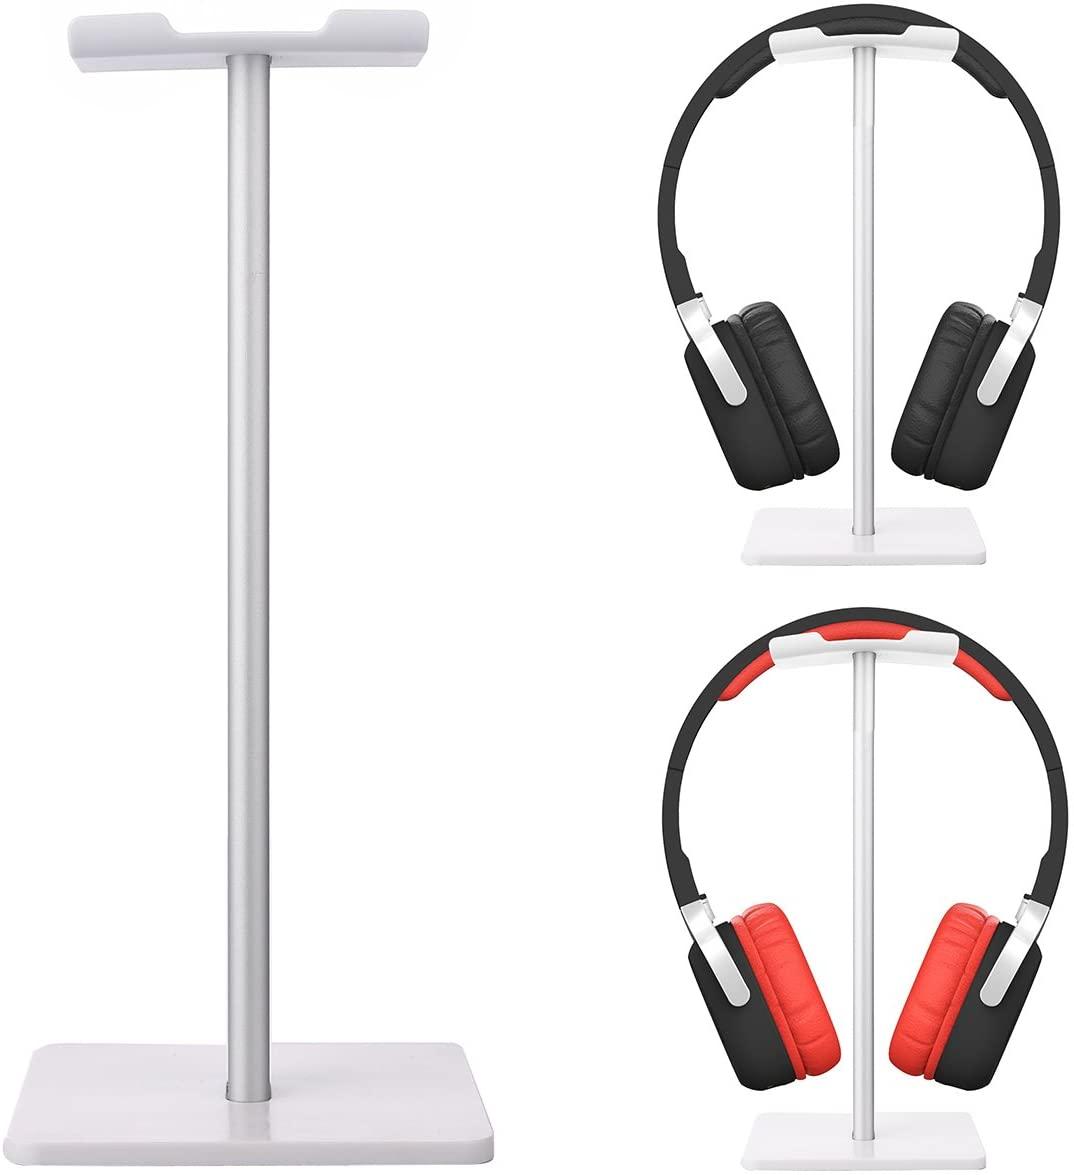 Headphone Stand Hanger Universal Earphone Holder Display Earbuds Mount Gaming Aluminum Headset Rack for Home Office Desk Table (White)